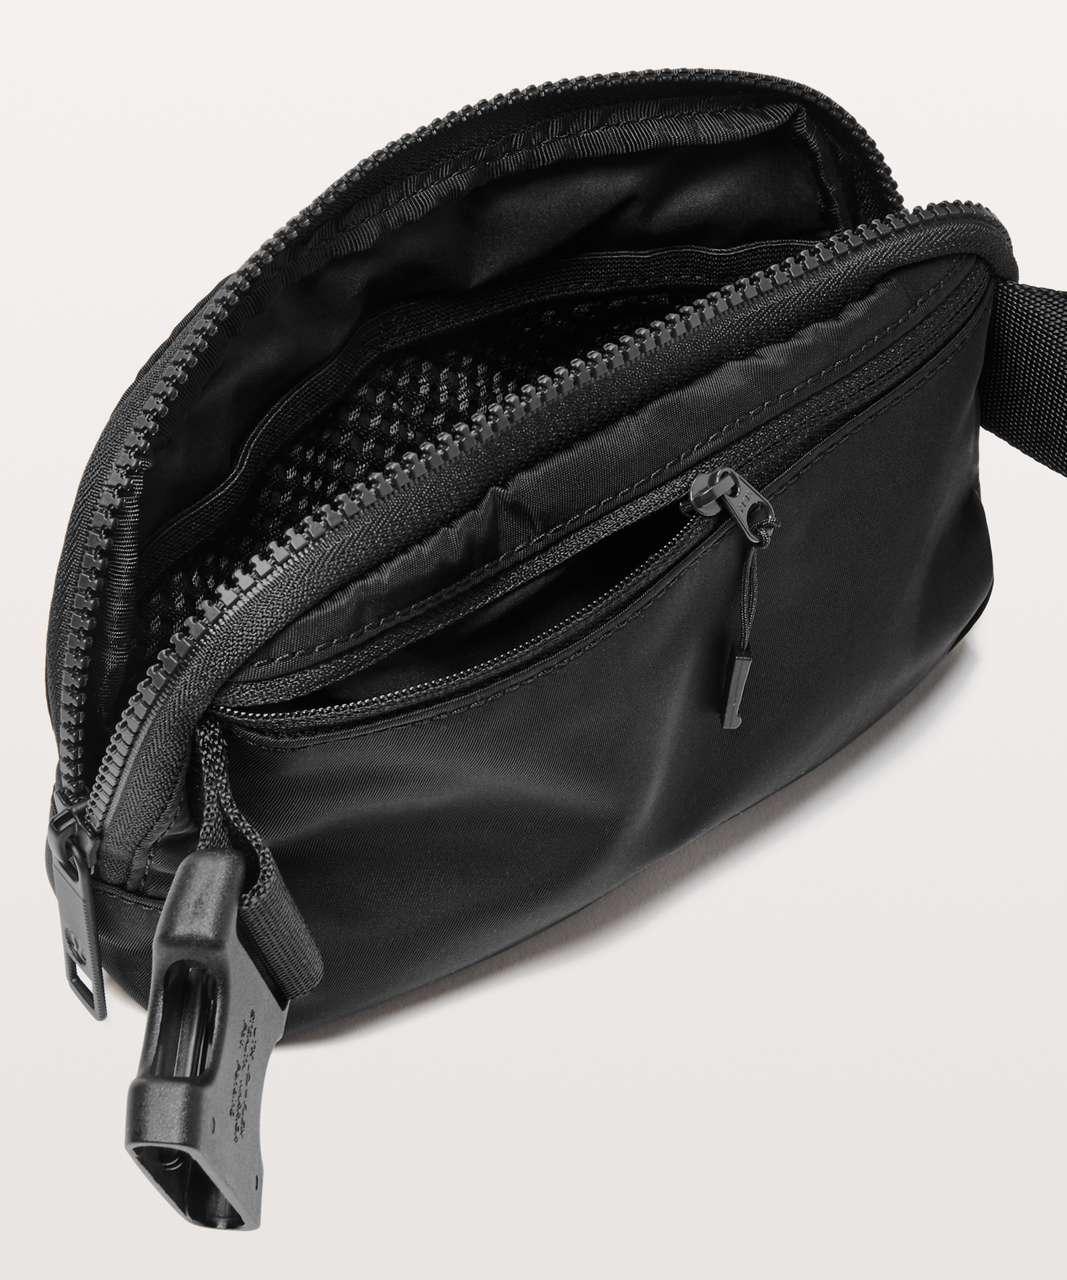 Lululemon Everywhere Belt Bag *1L - Black (First Release)